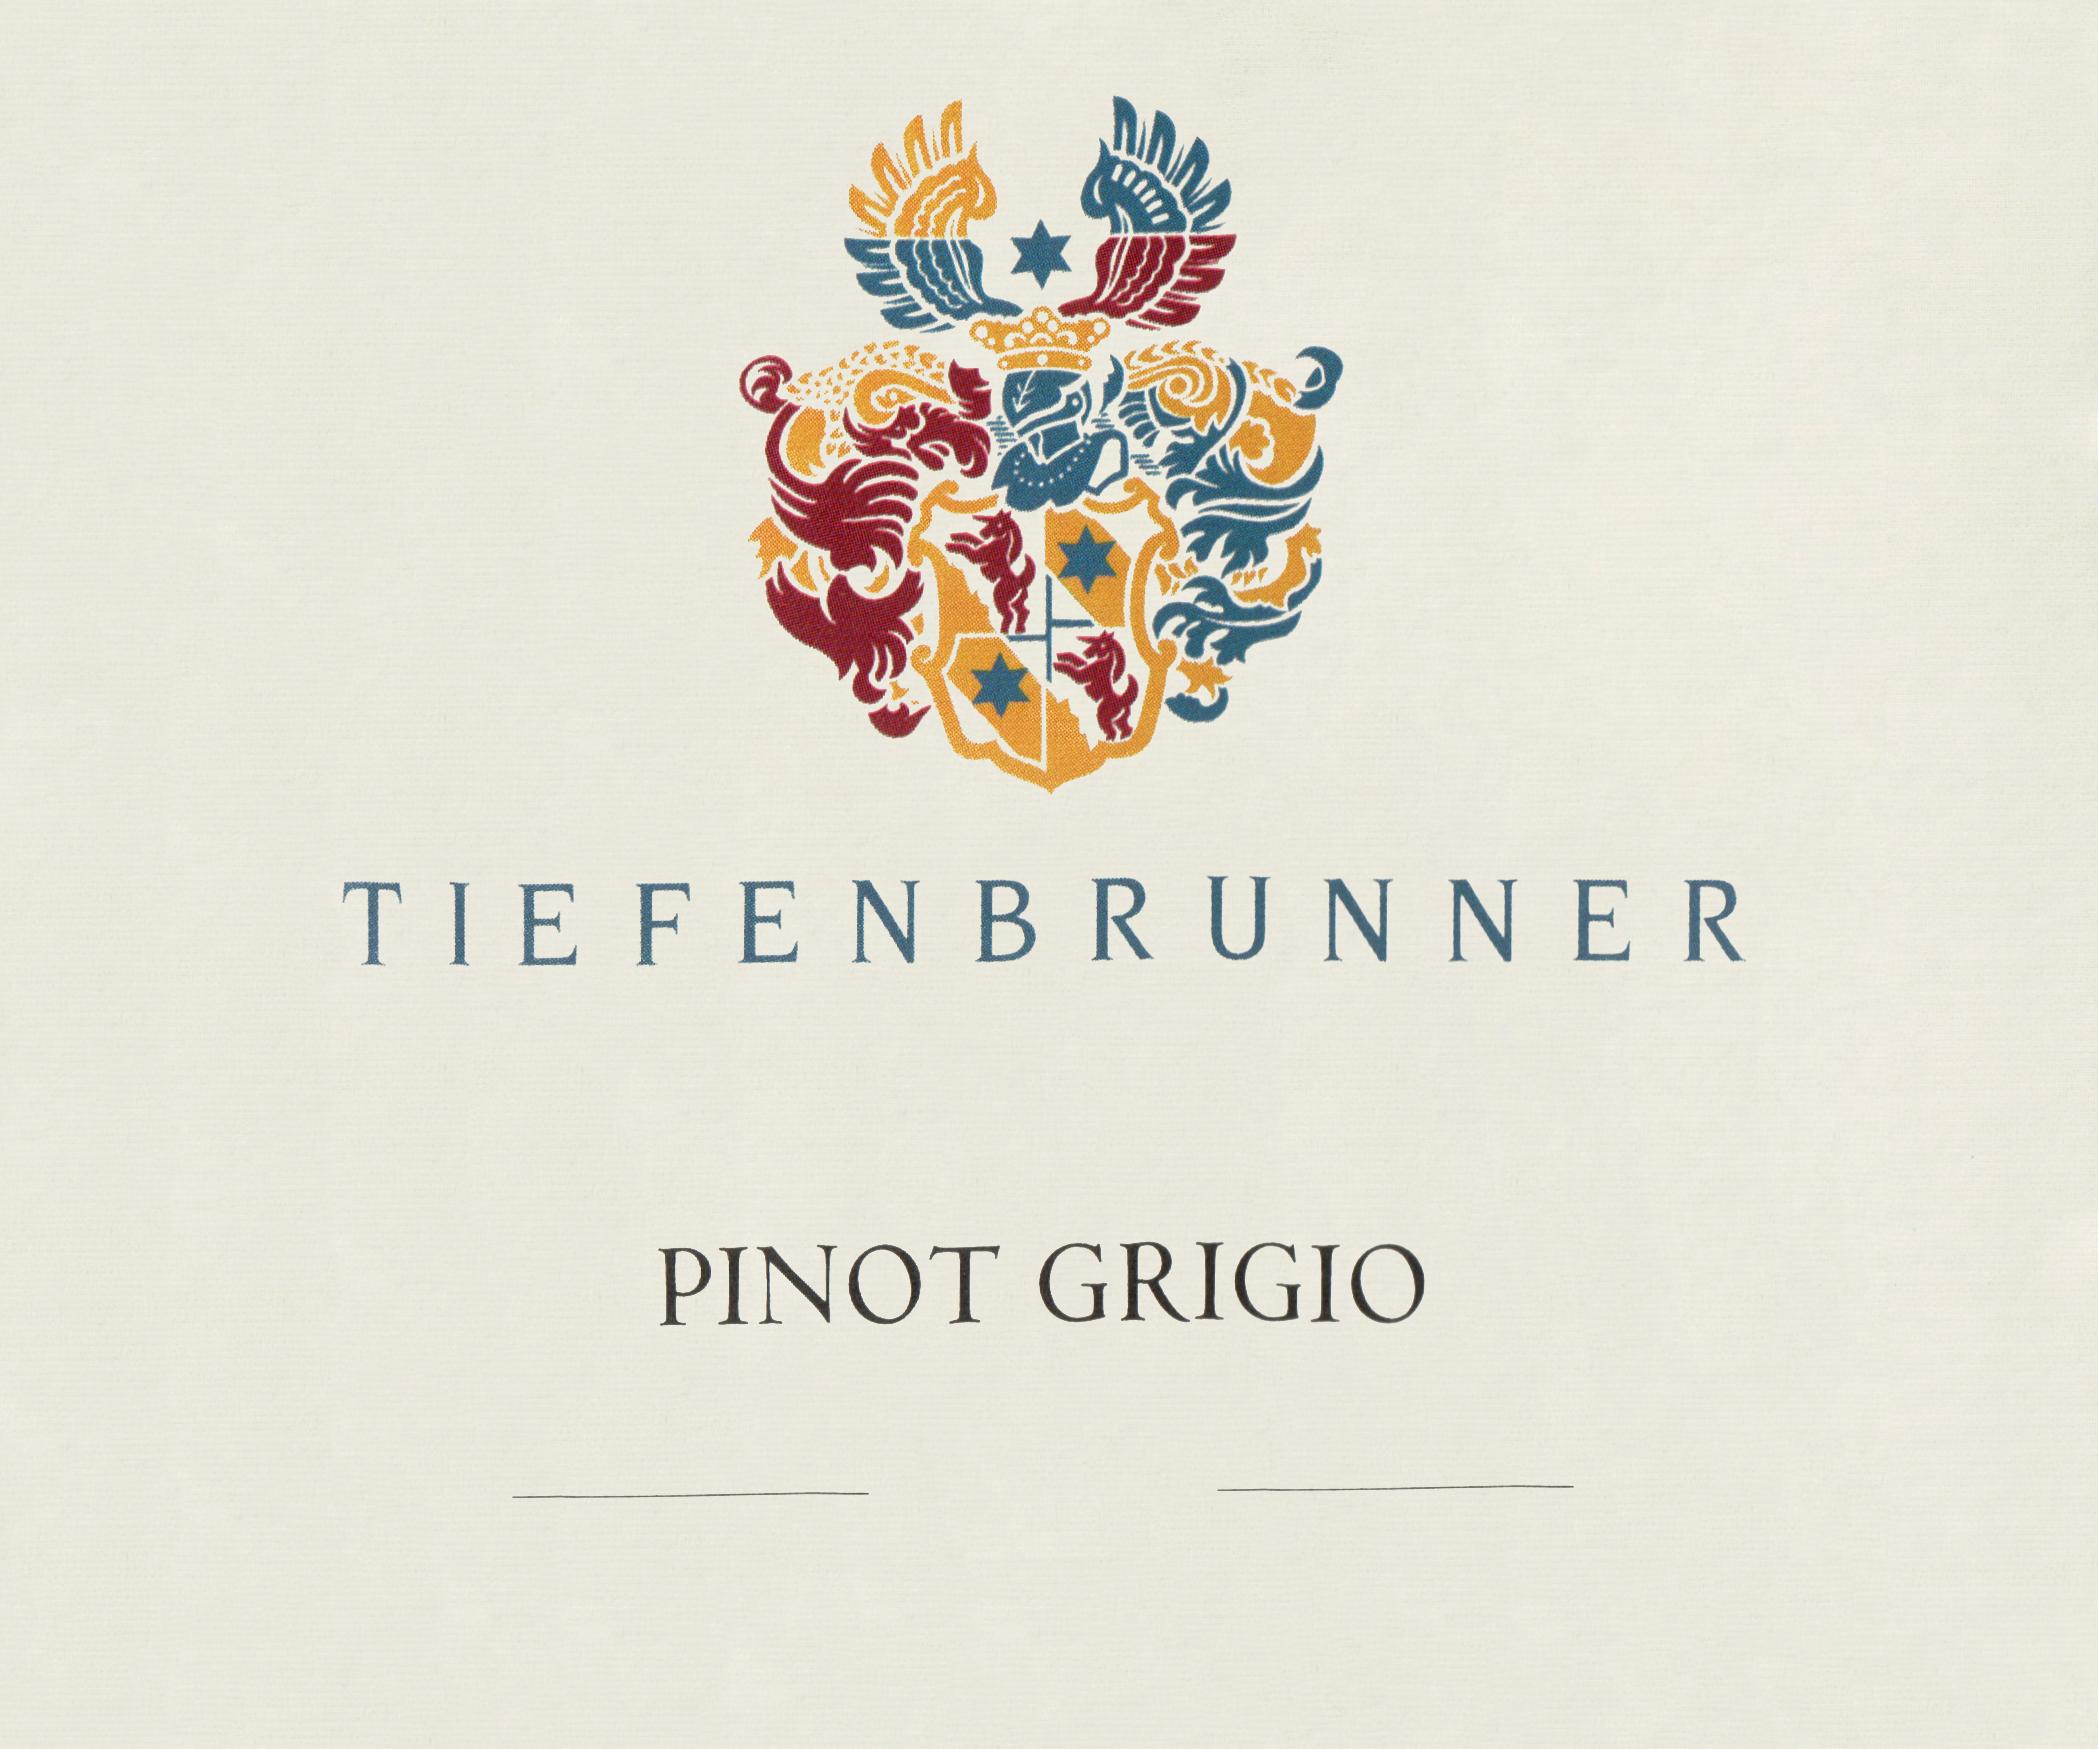 Tiefenbrunner Pinot Grigio 2019